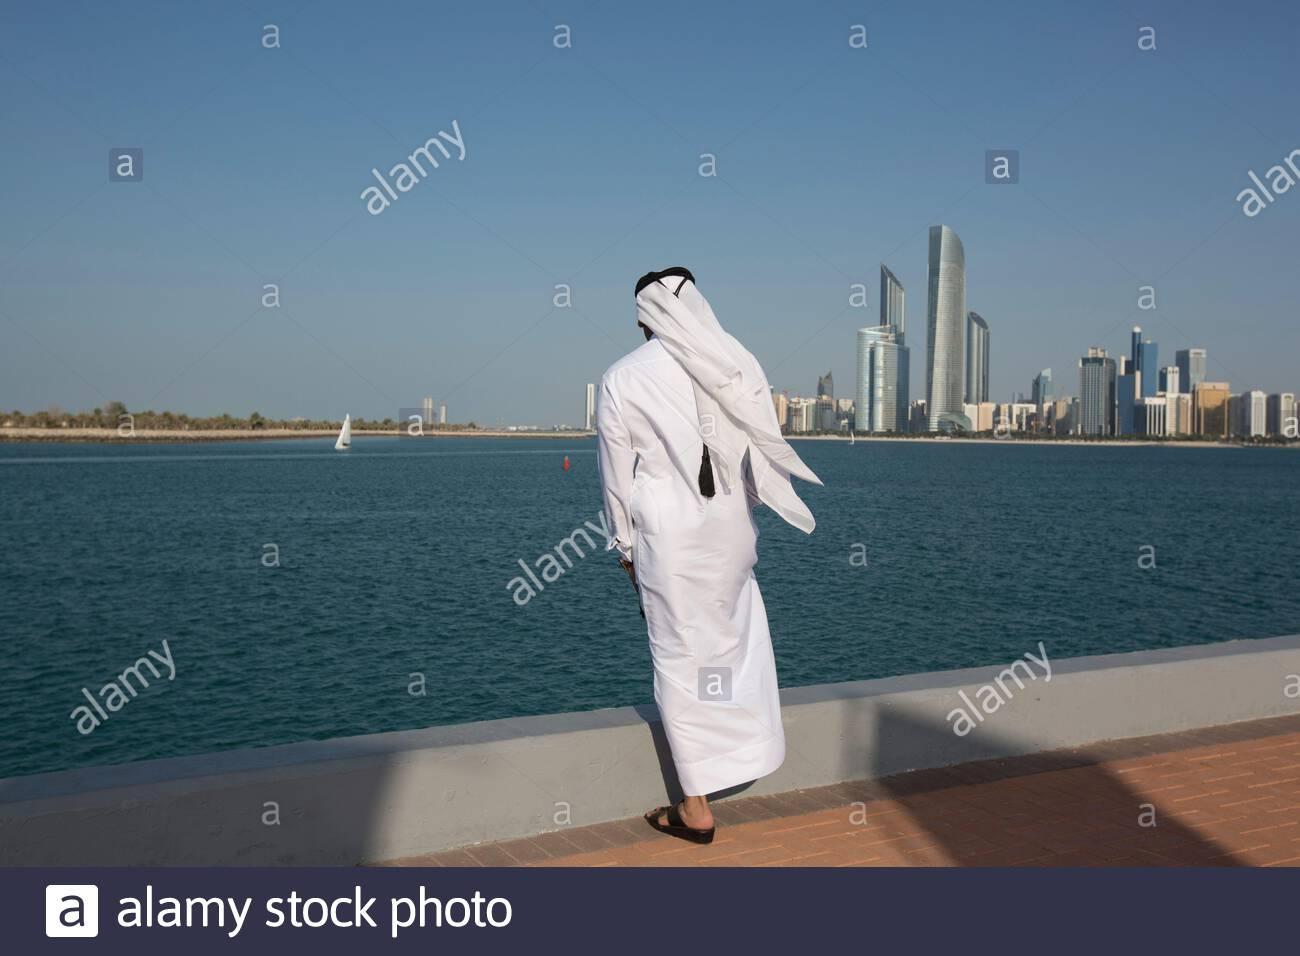 United Arab Emirates - Abu Dhabi - A Emirati man looking towards Business District. Stock Photo